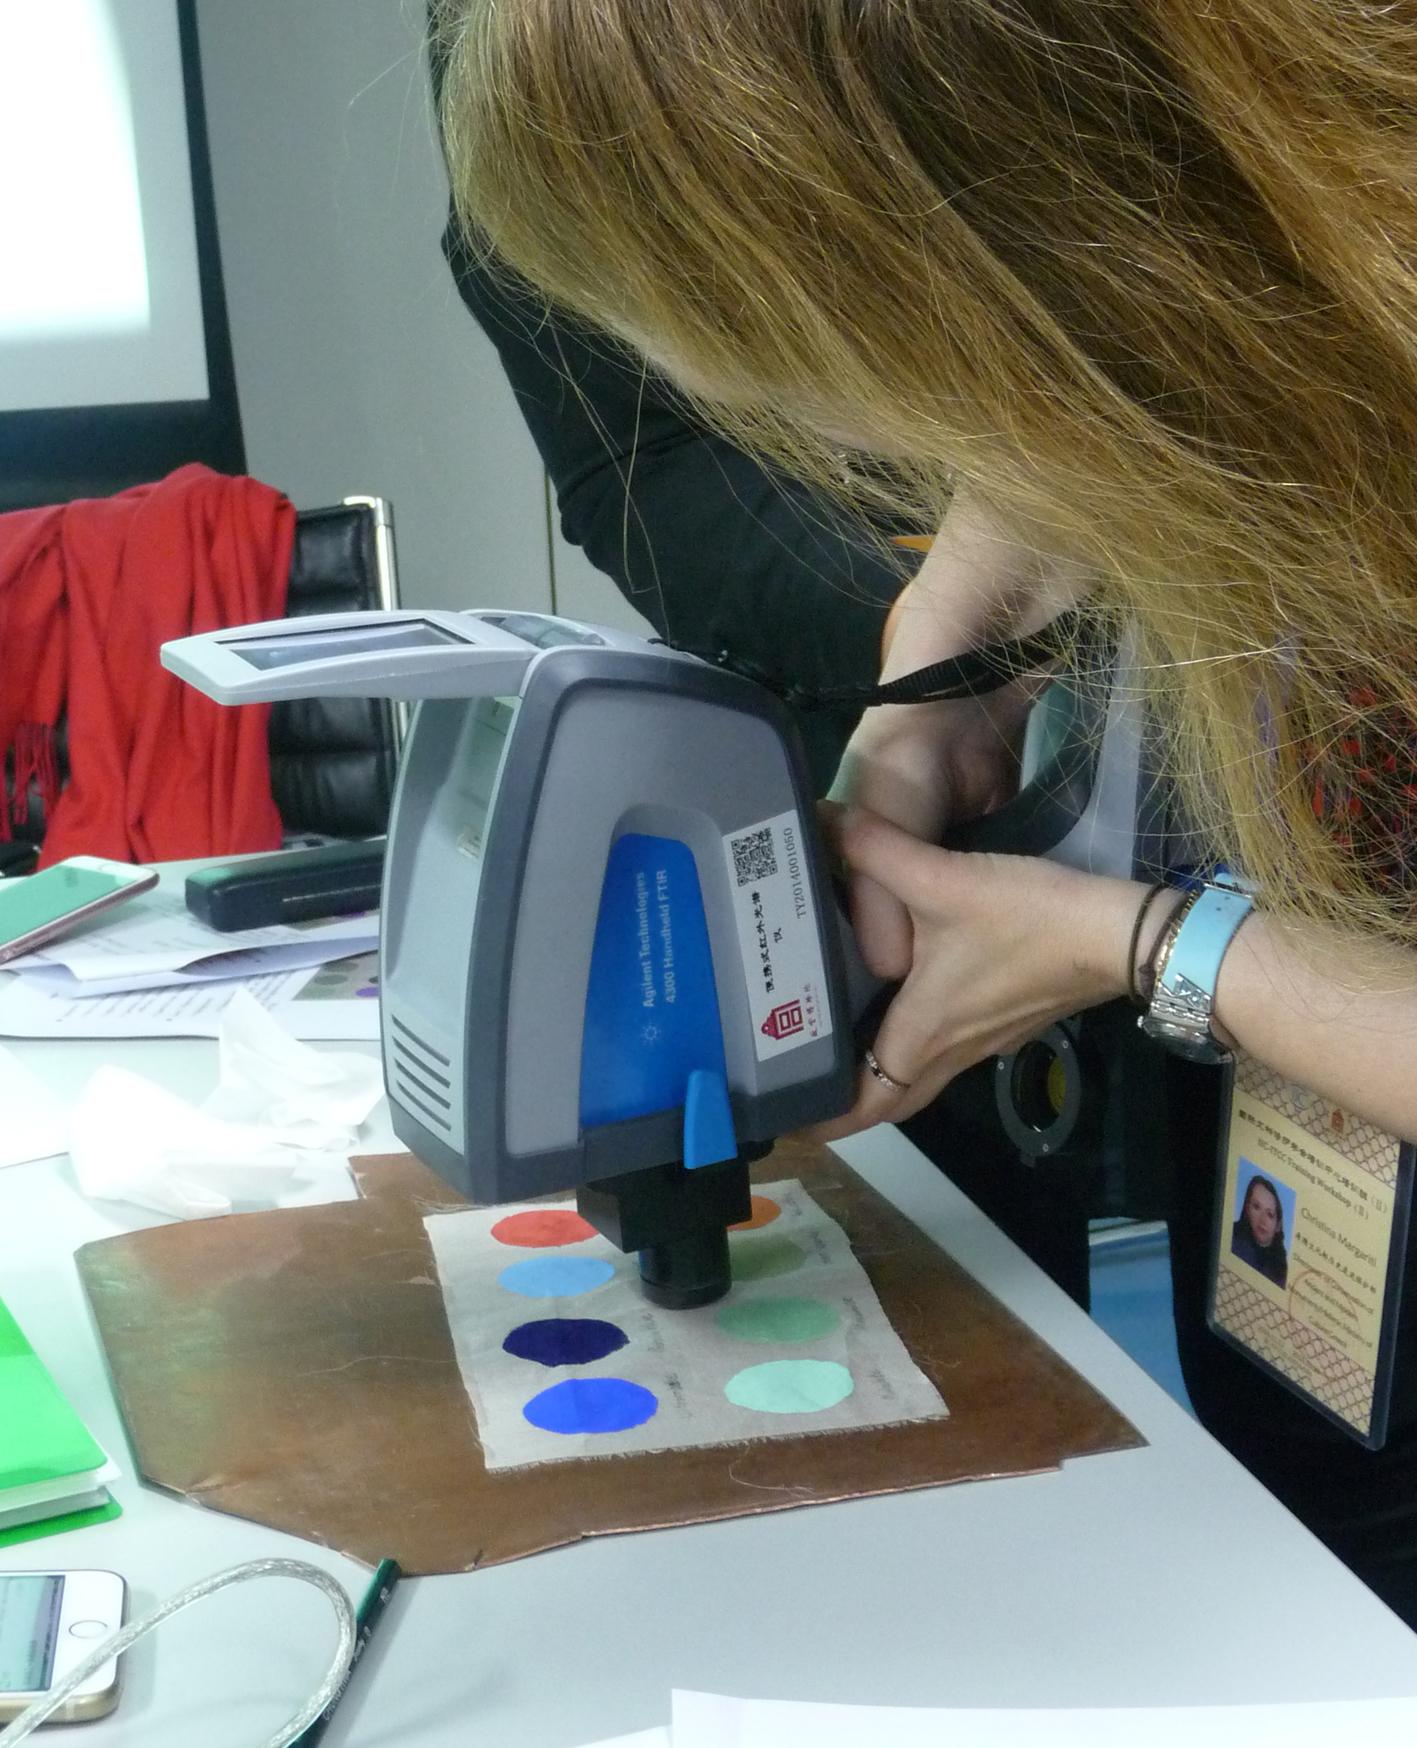 Fourier transform infrared microspectroscopy (FTIR). Photo C. Margariti.